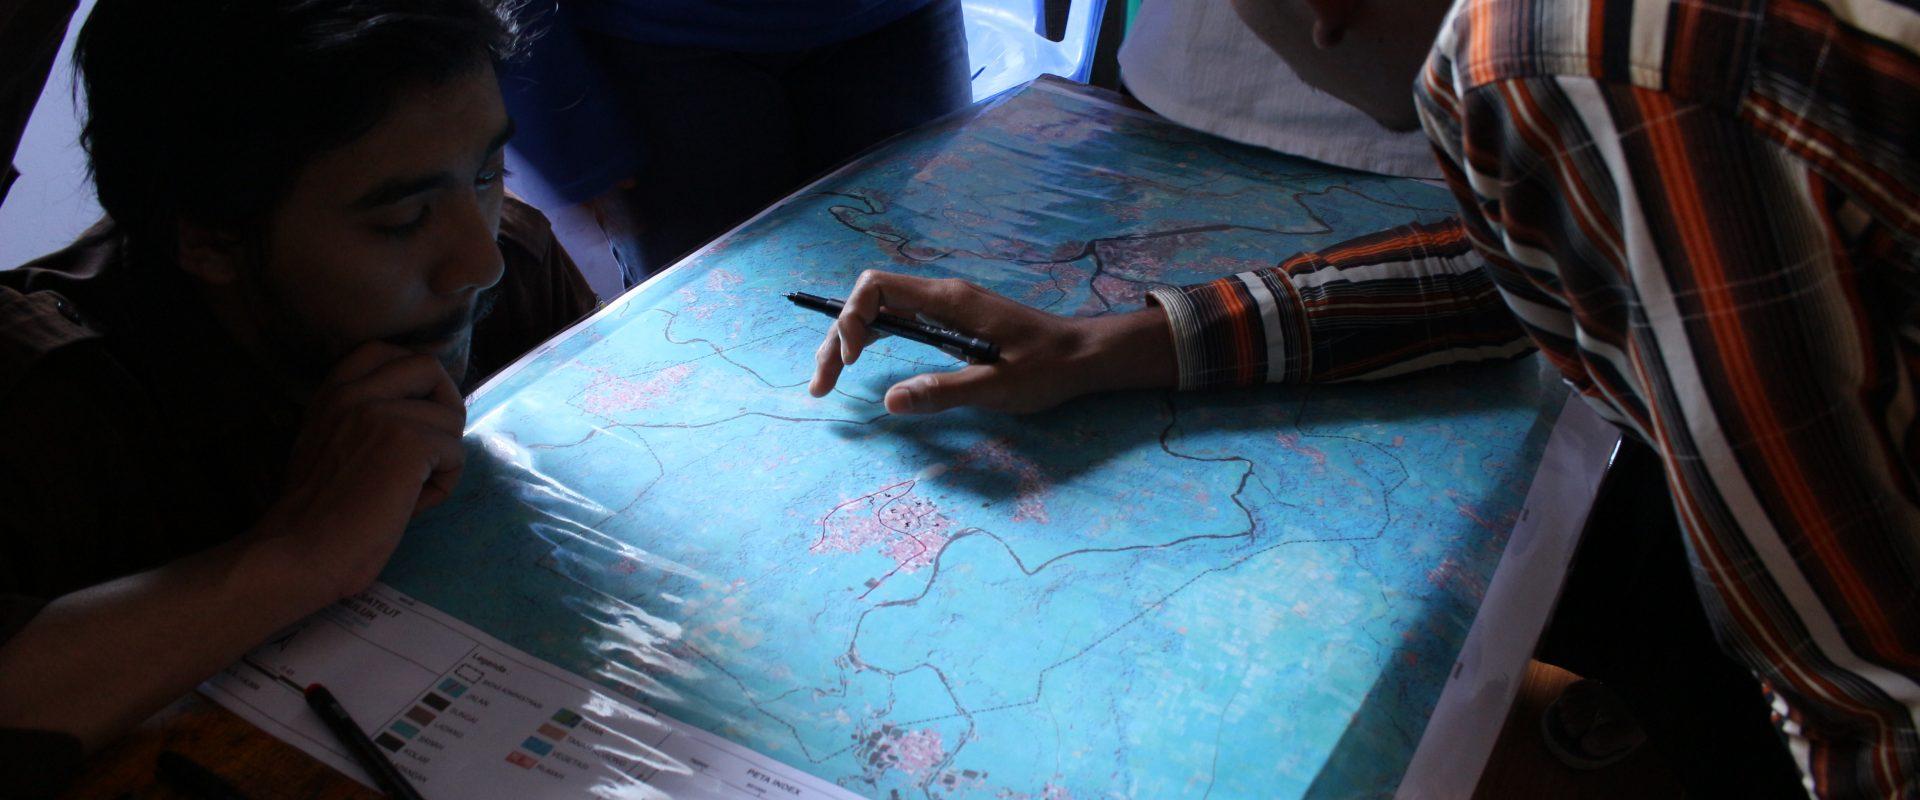 Membuat Peta Tematik Desa Cibuluh untuk Mengabdi Pada ...